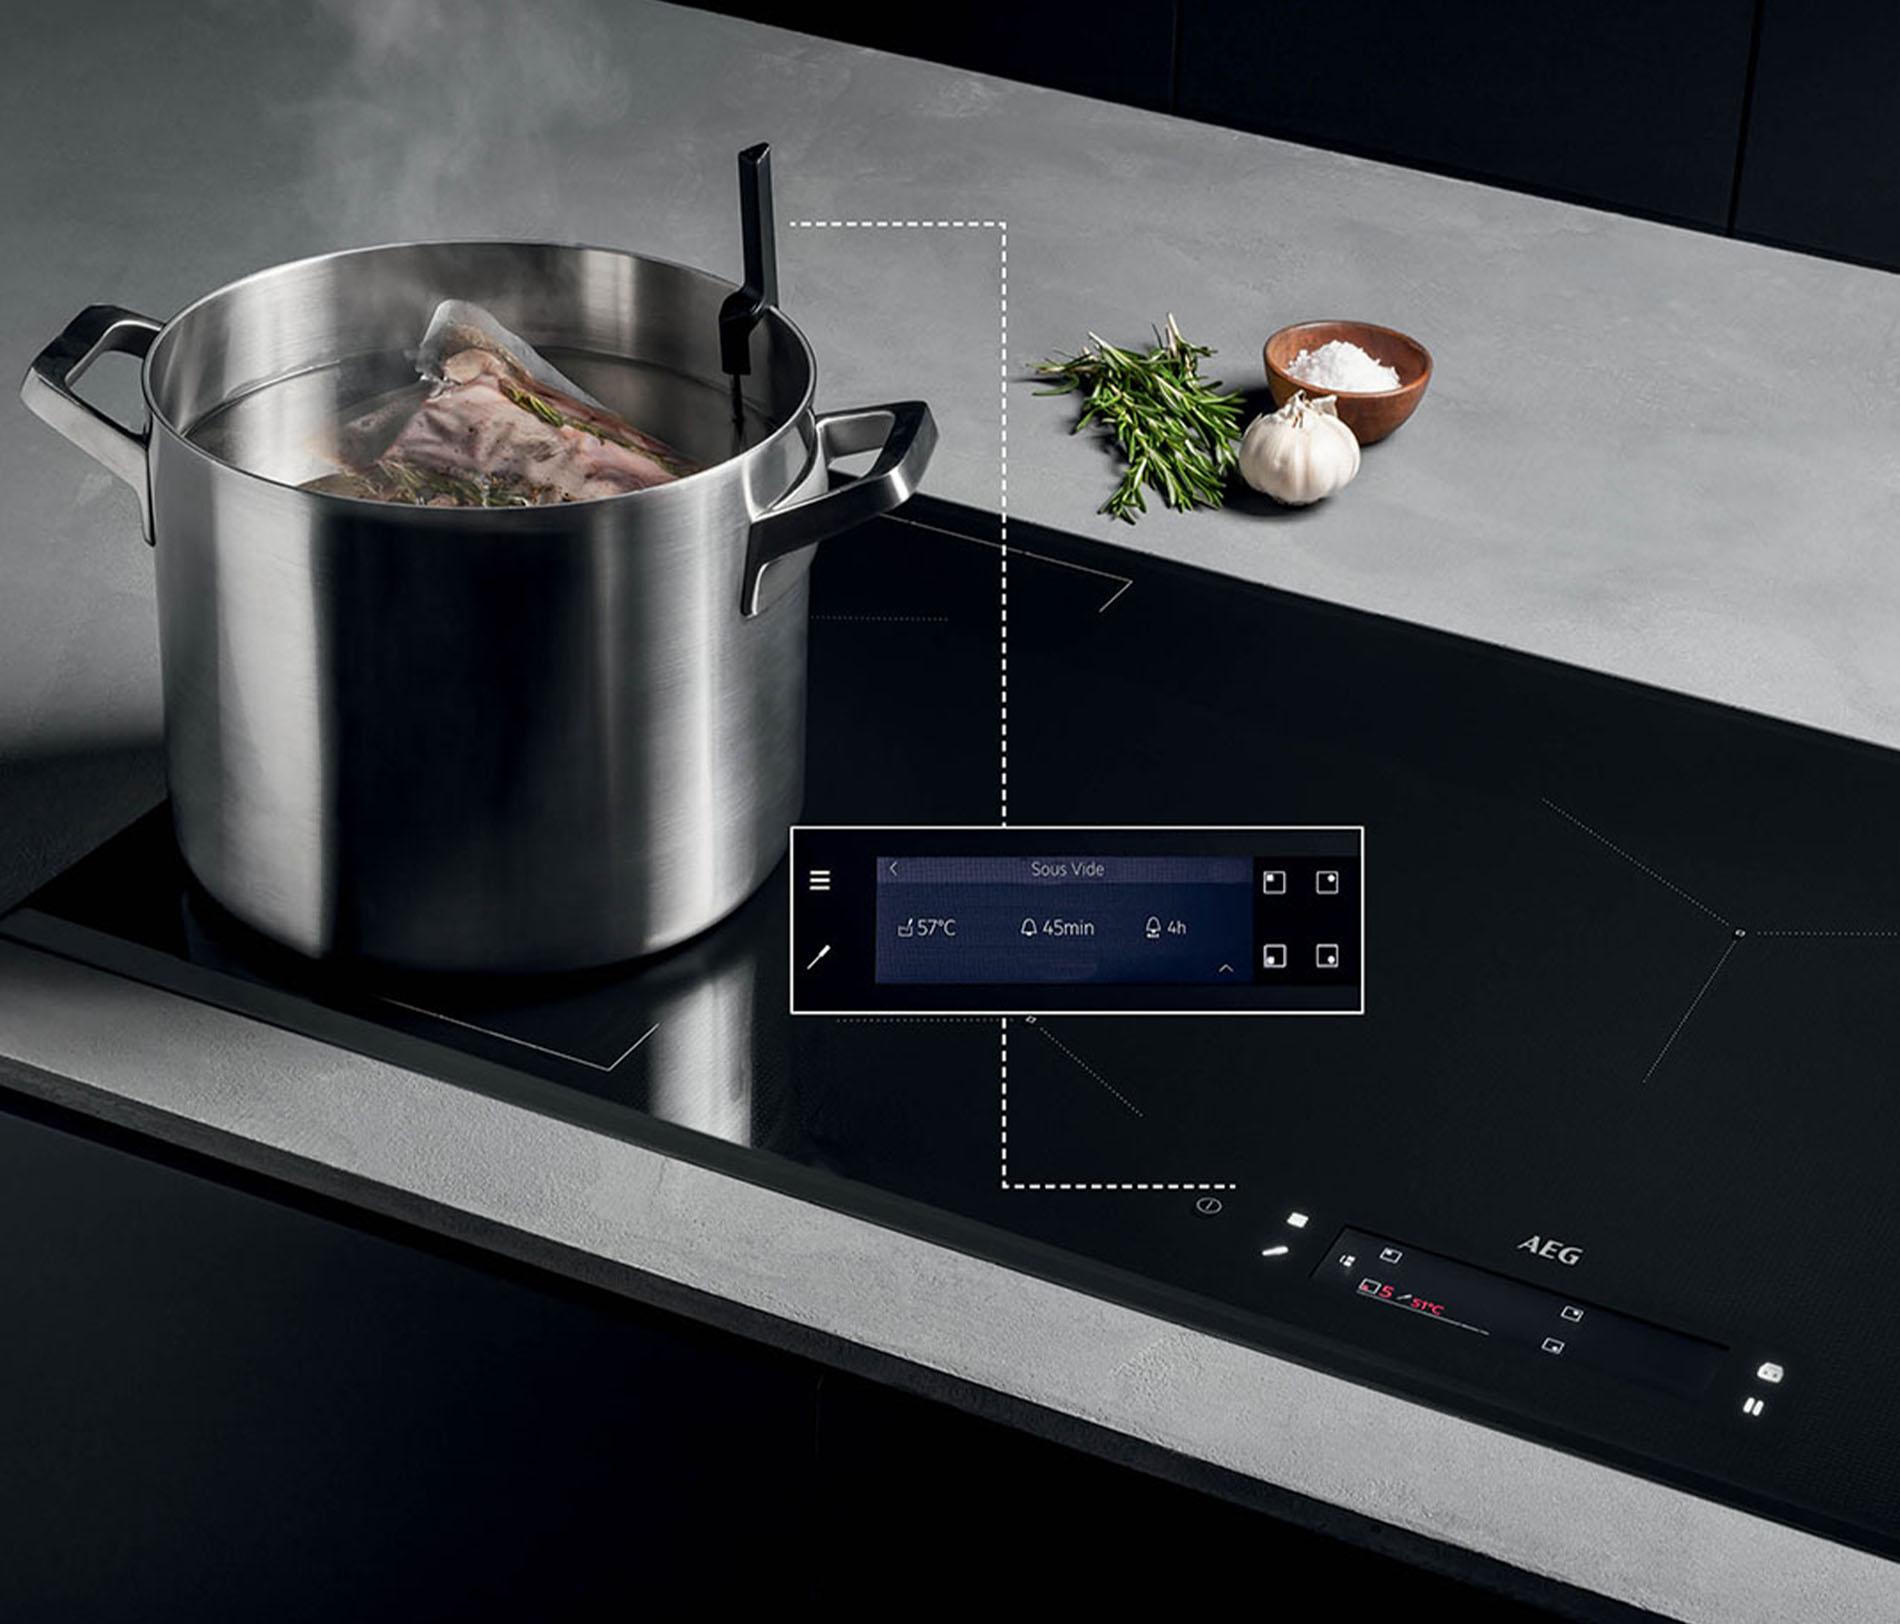 Keukentrends 2020 - AEG SenseCook inductiekookplaat, Keukenapparatuur ASWA Keukens